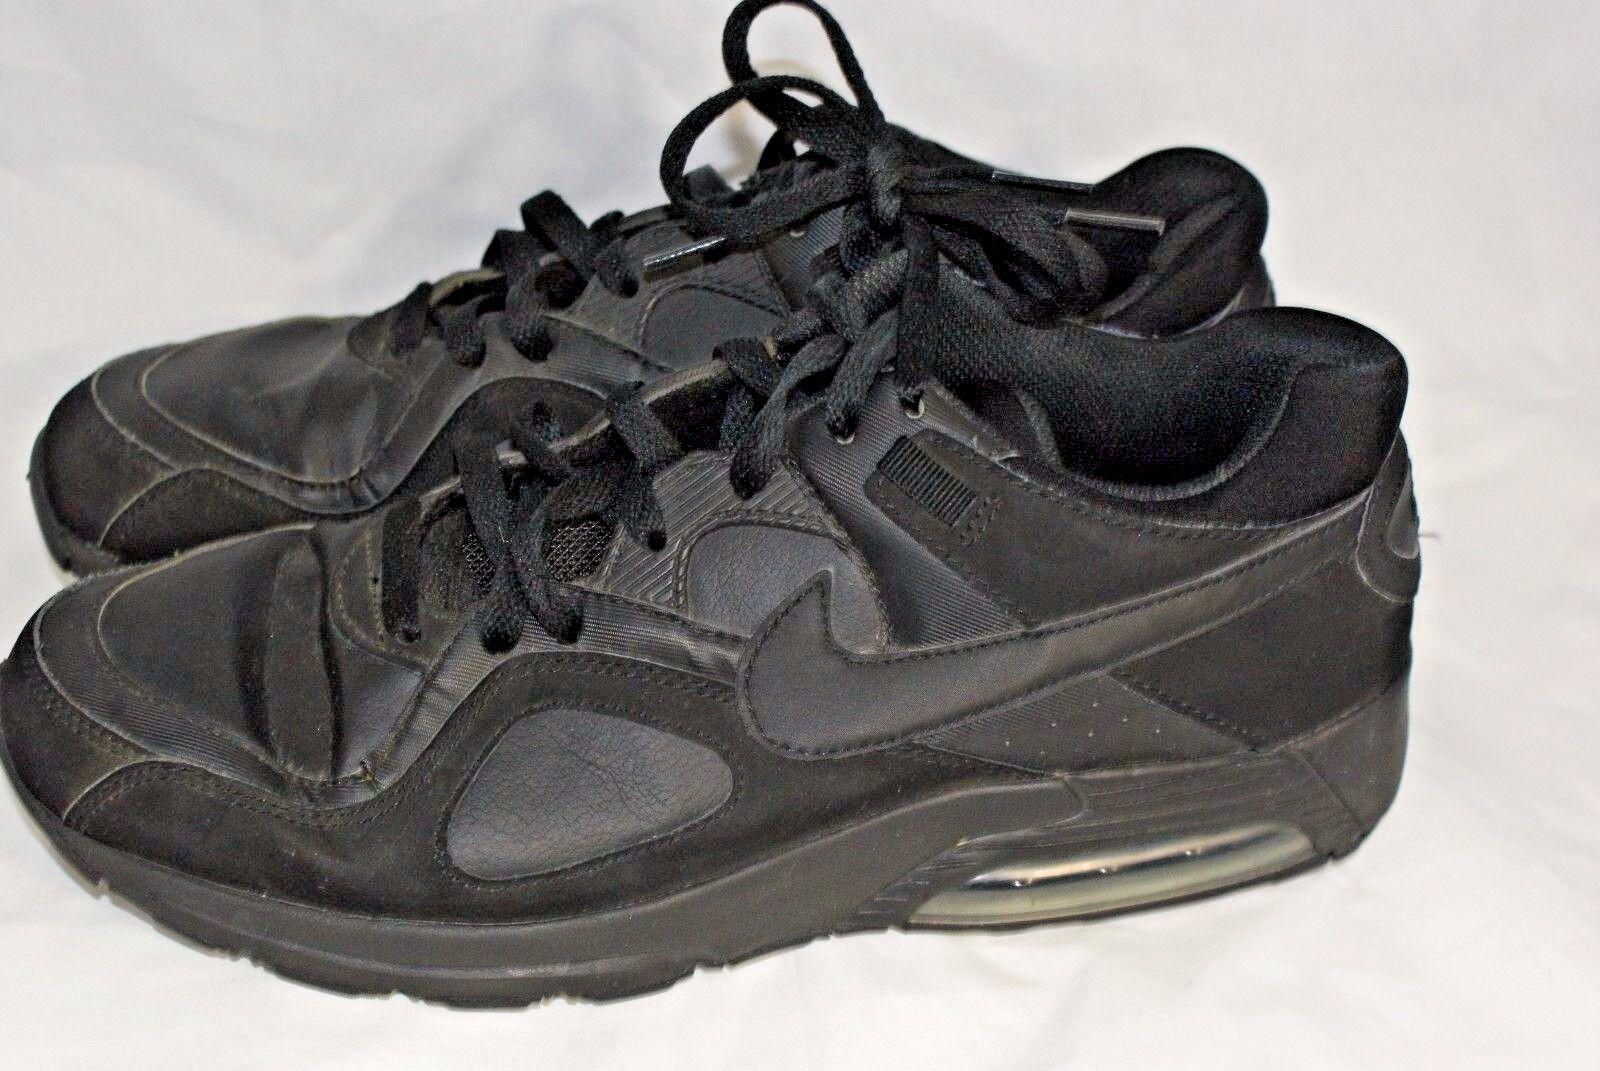 on sale 6dce6 905ff ... reduced nike roshe run rosherun shoes mens new 511881 400 sneakers  024f63 0fe59 7e108